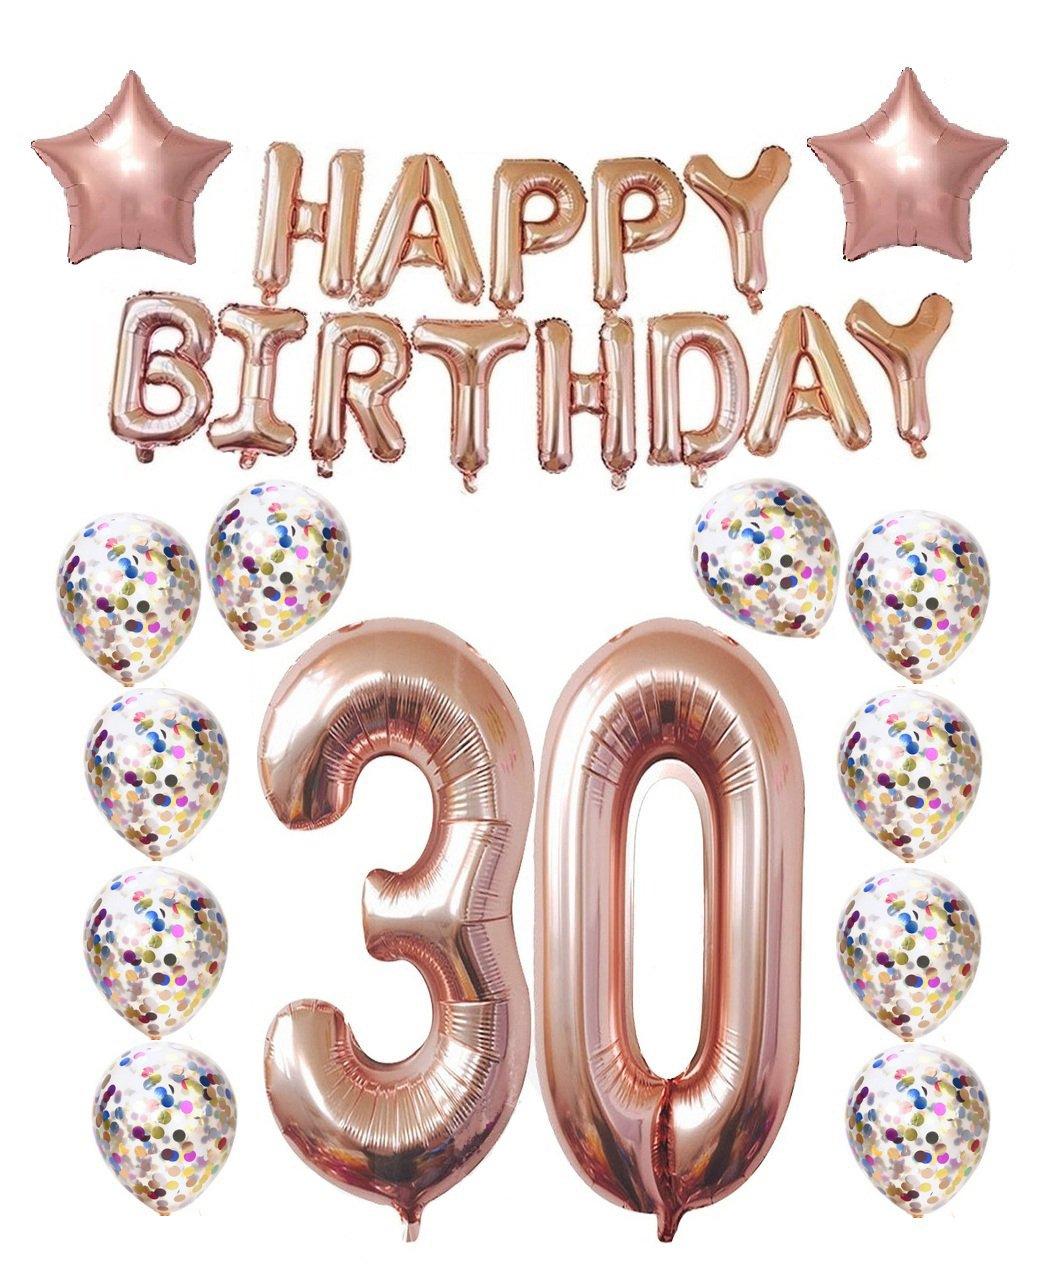 30th Birthday Decorations Party Supplies, Thirtieth Birthday Balloons Rose Gold, Rose Gold Hang Happy Birthday Alphabet Balloons Banner, Gold Confetti Balloons, 30th Birthday for Women Mity Rain